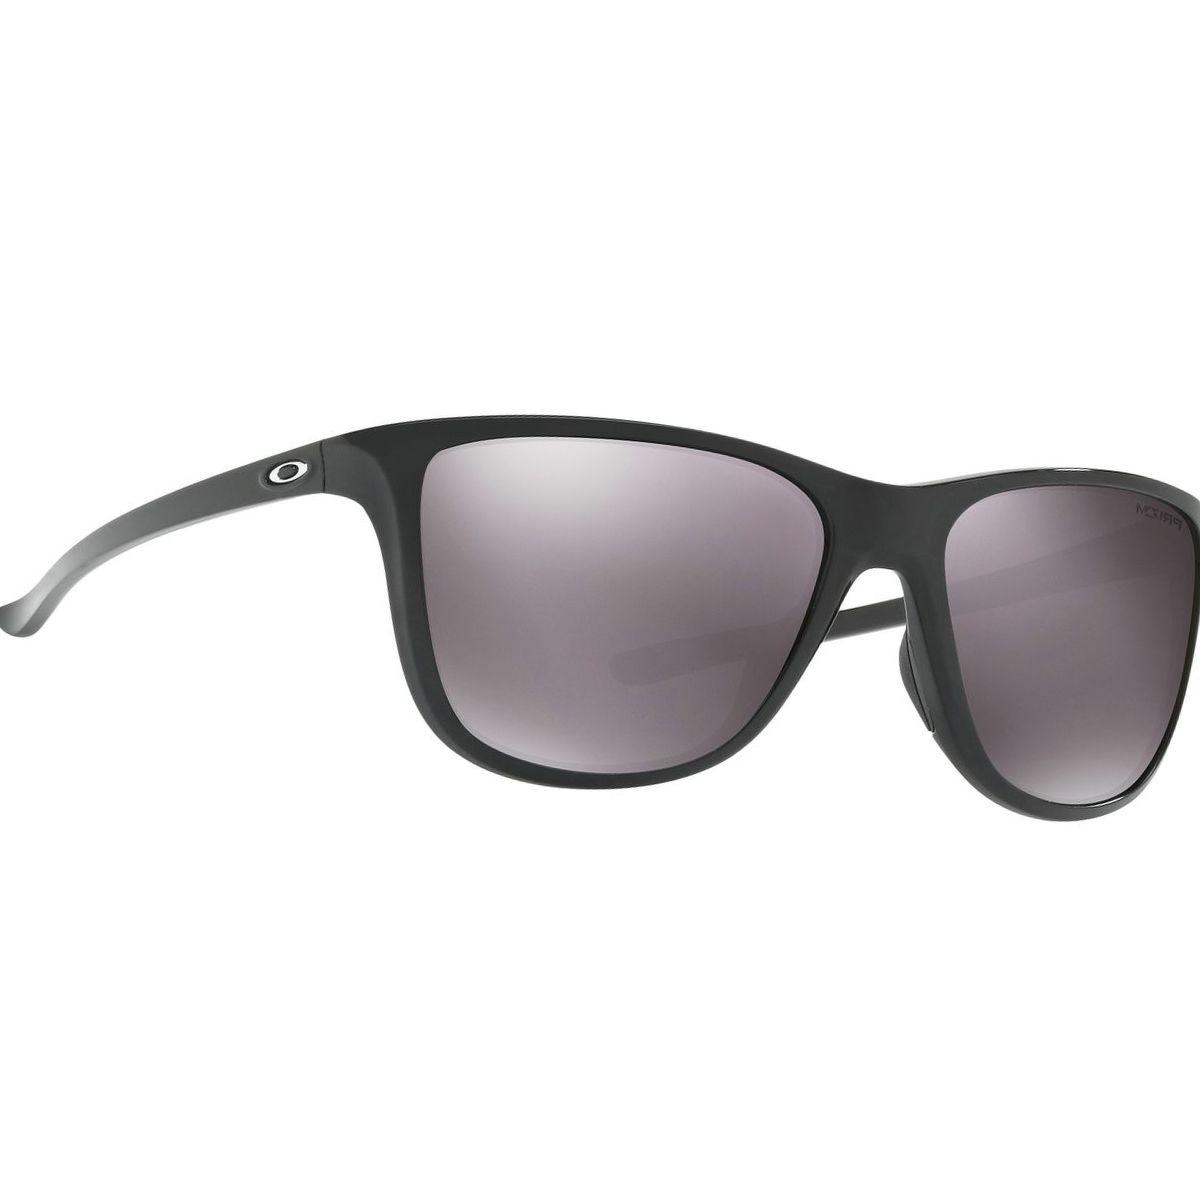 Oakley Reverie Prizm Polarized Sunglasses - Women's